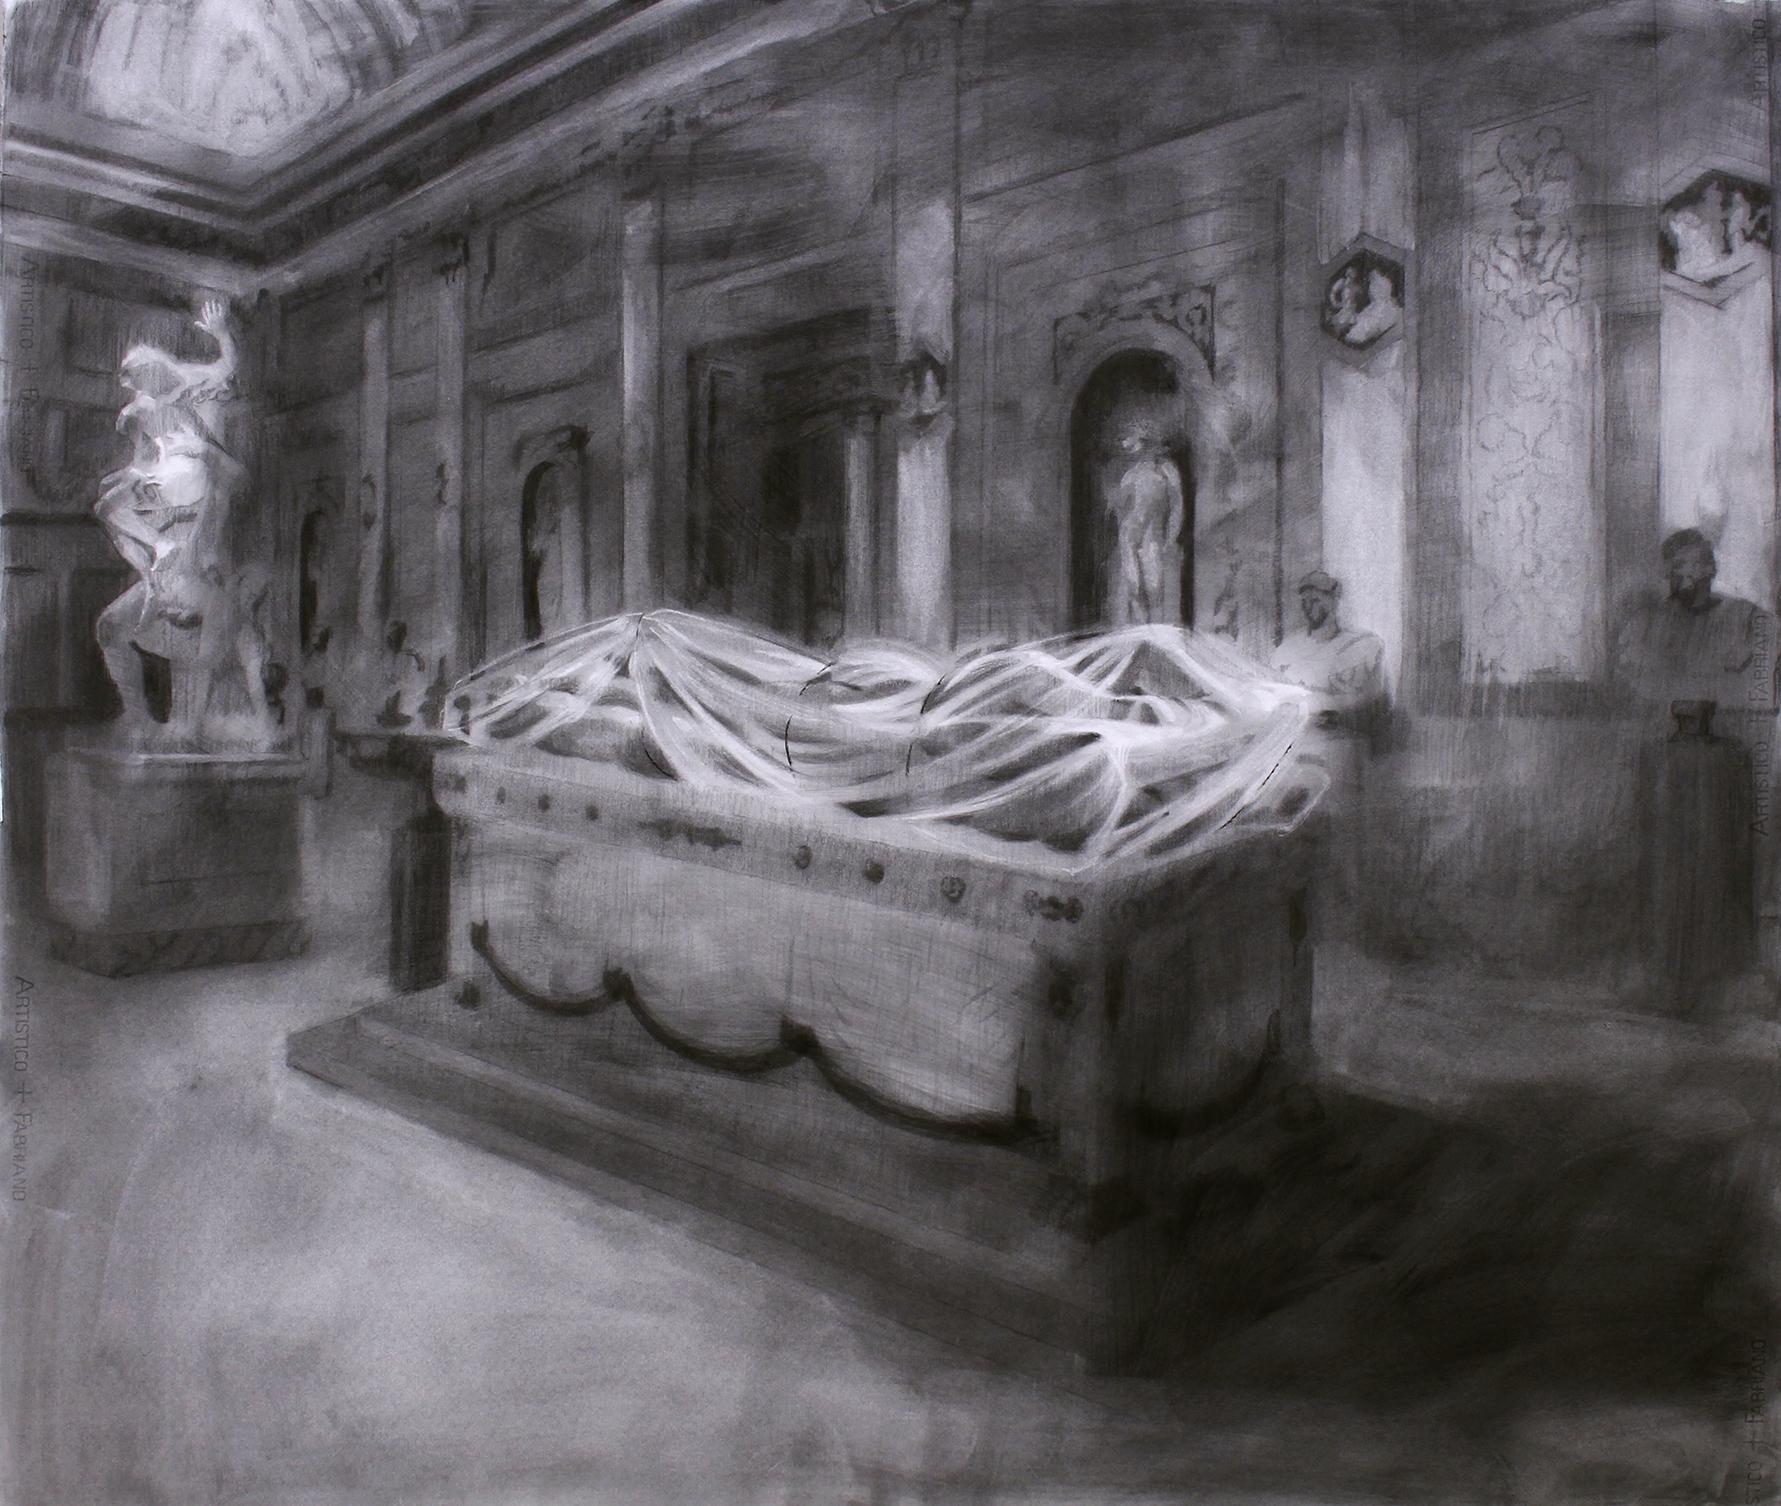 El Hermafrodita dormido regresa a la Villa Borghese. Carboncillo sobre papel. 120 x 140 cm.